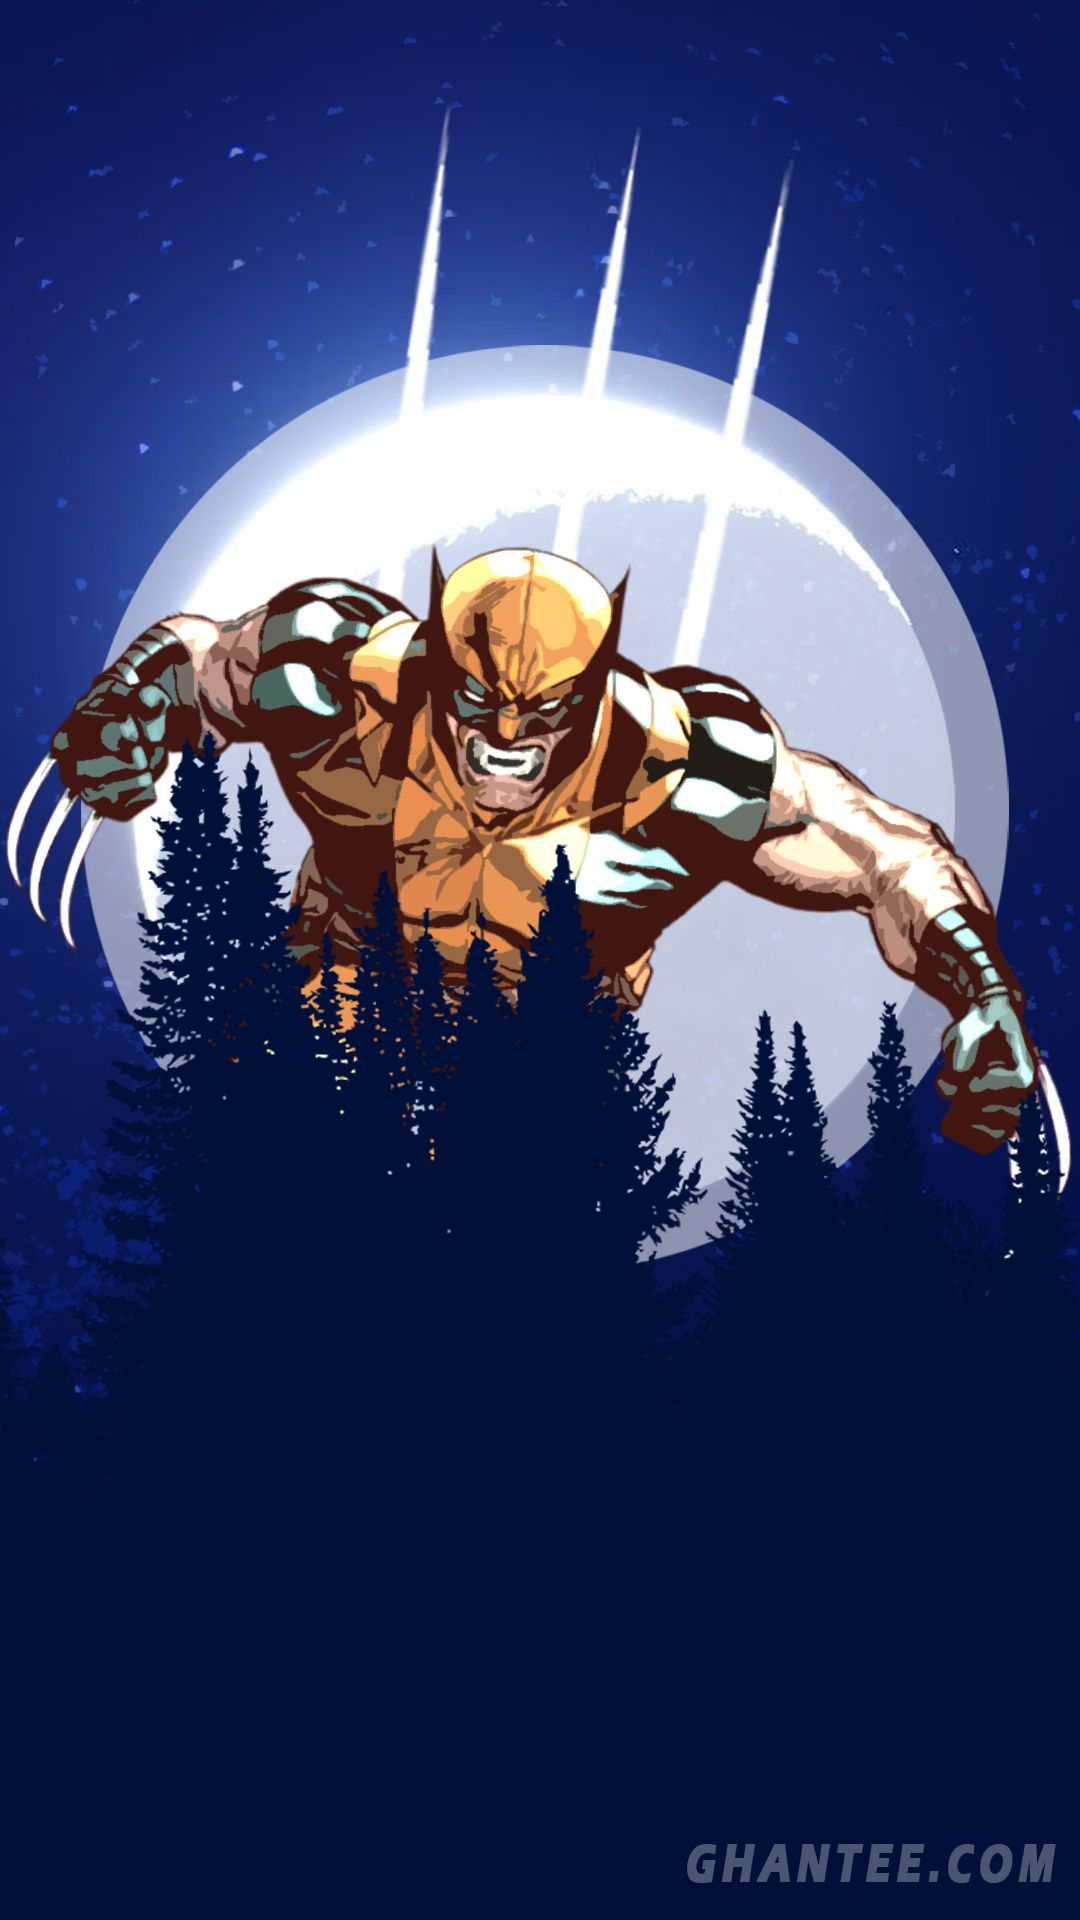 Wolverine Hd Phone Wallpaper Full Hd Hd Phone Wallpapers Phone Wallpaper Minimalist Wolverine Wallpaper